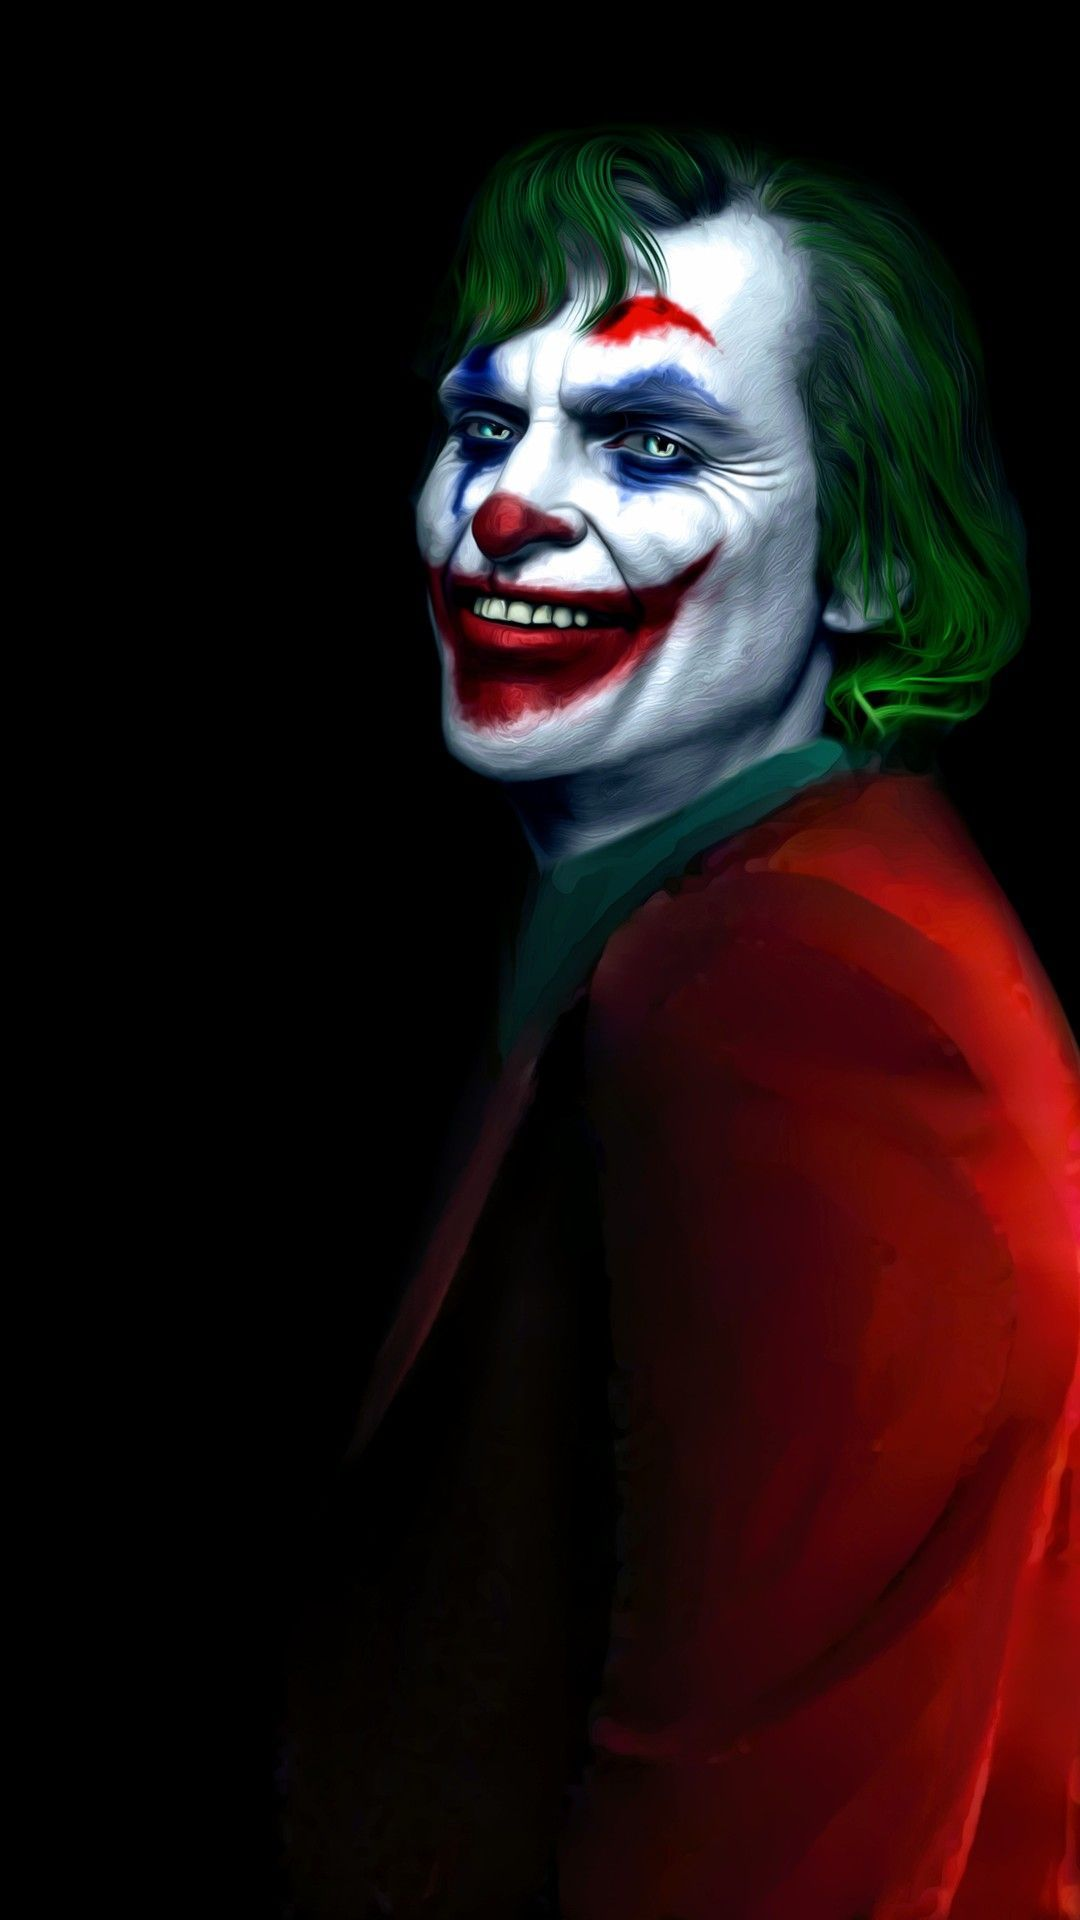 Joker Batman Thejoker Joaquinphoenix Joaquin Jokerquotes